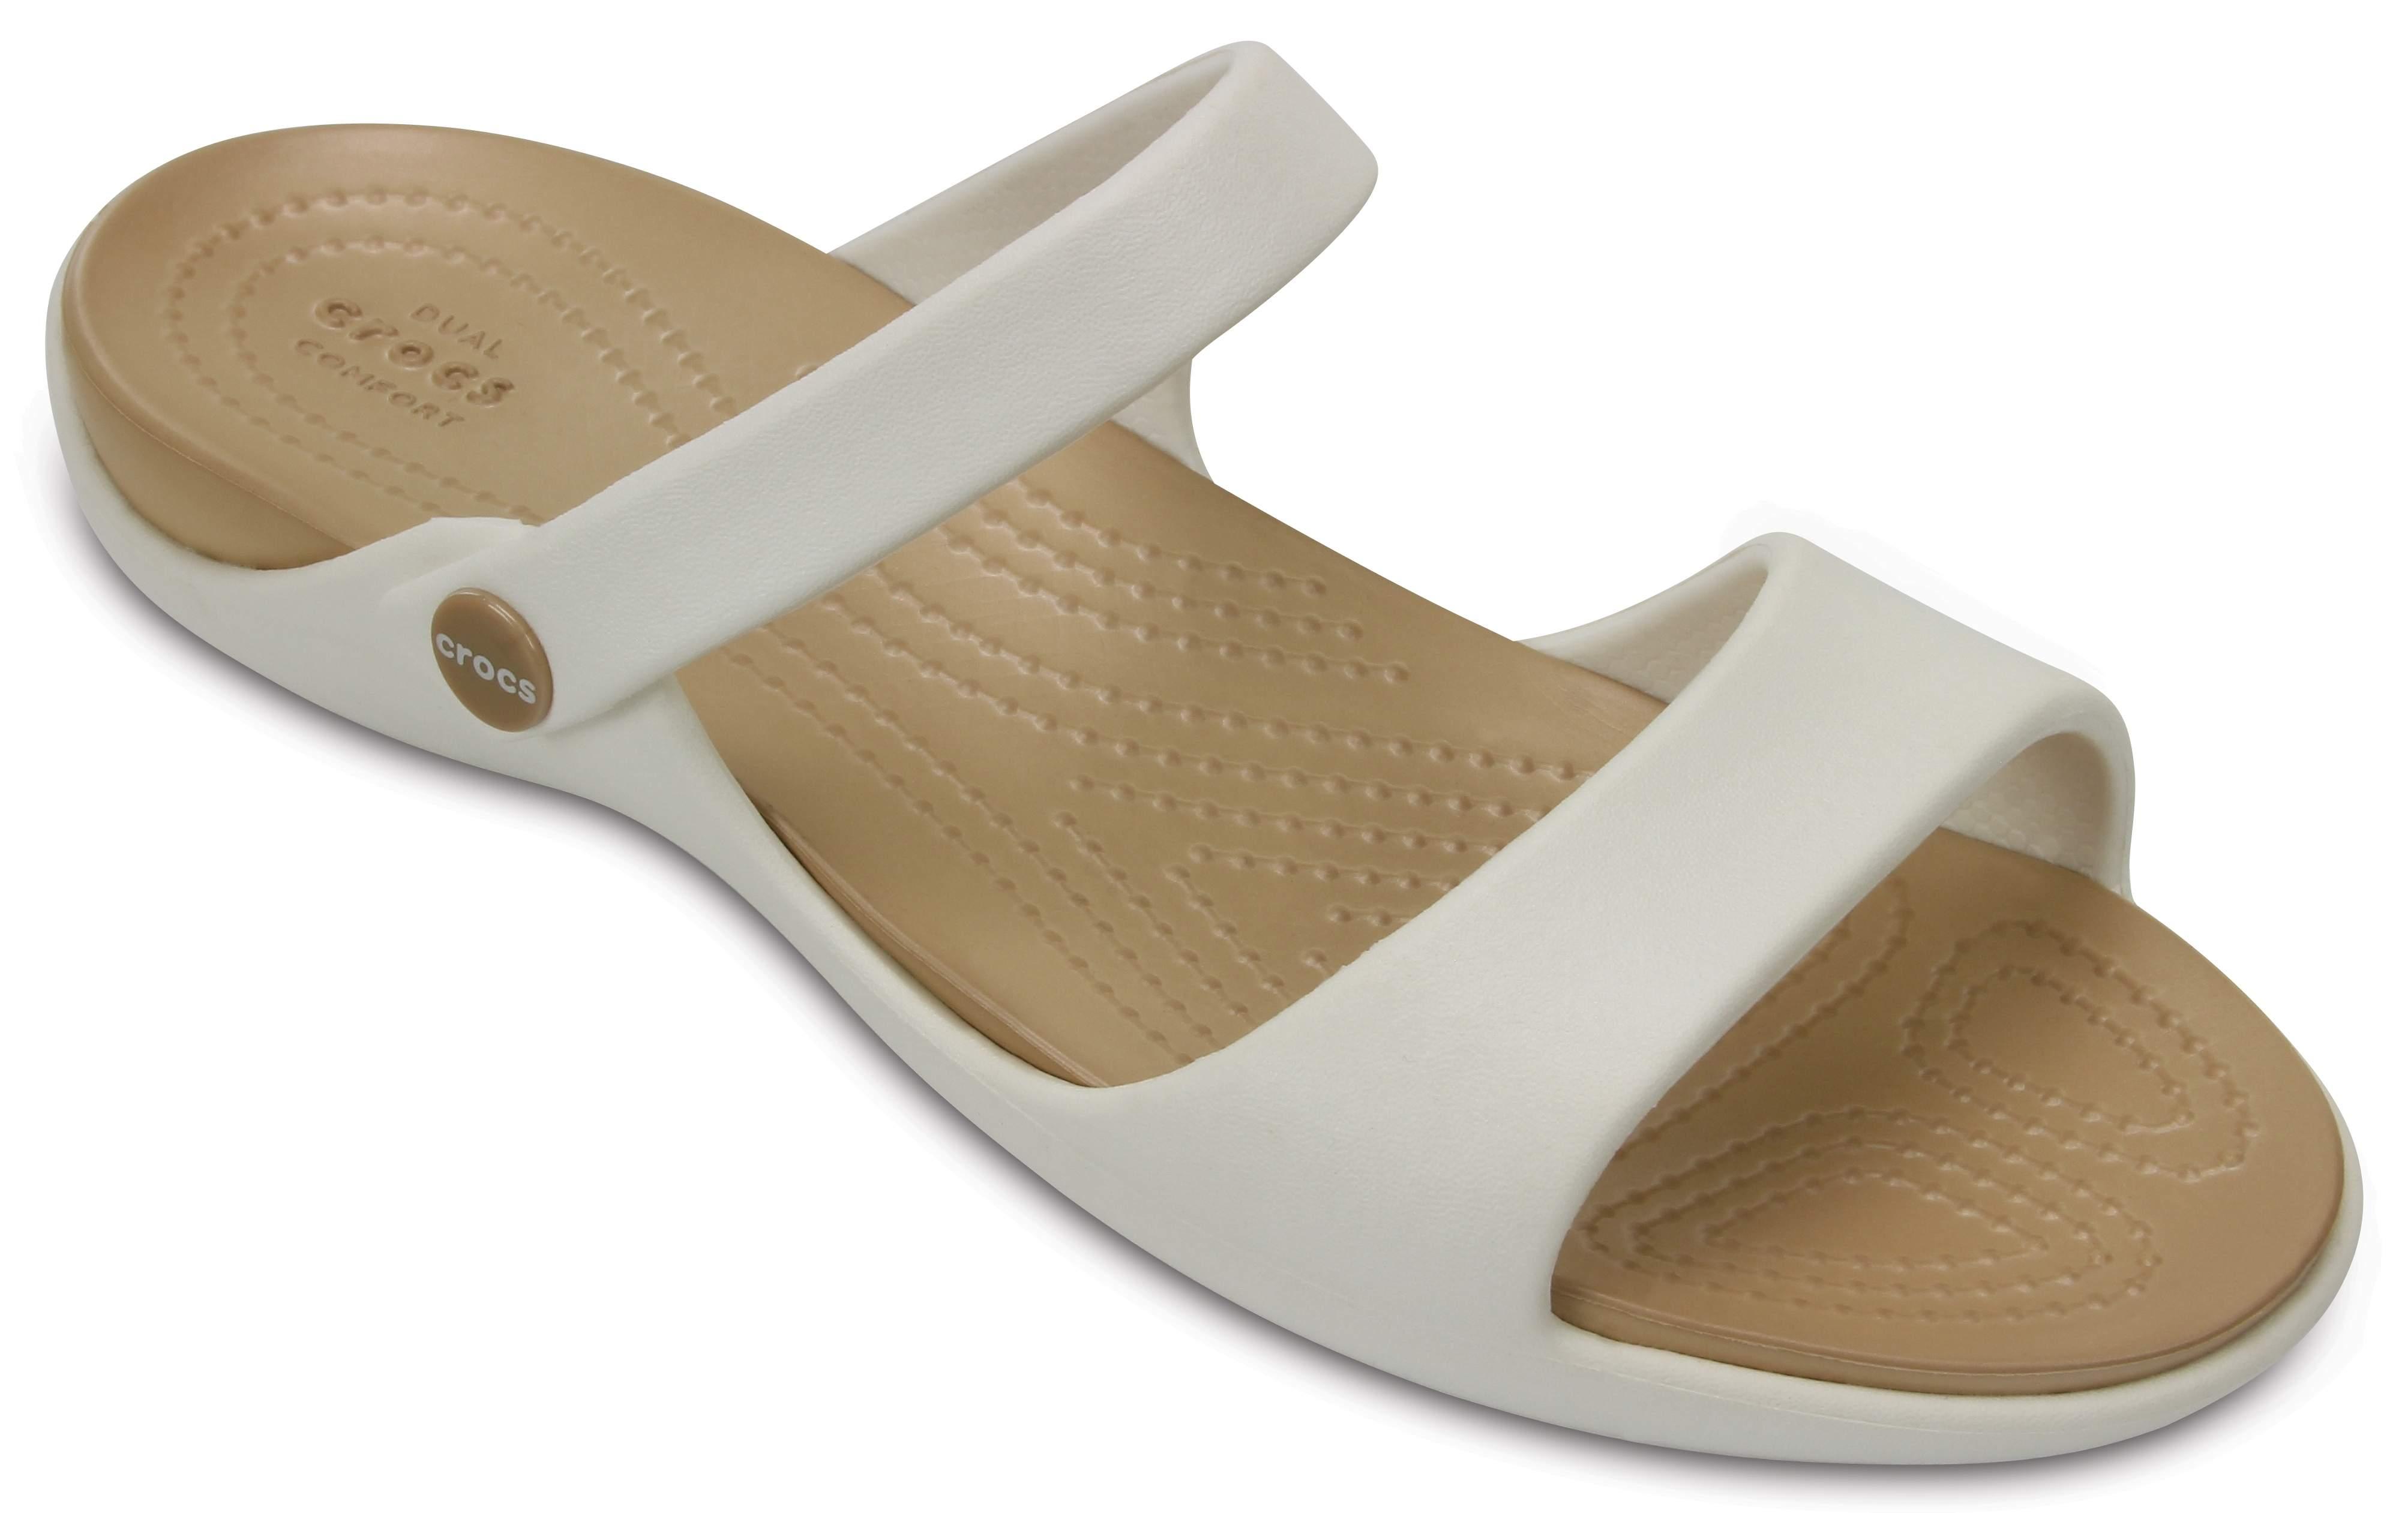 Crocs Damen Sandale Cleo V 204268-23D 34-35 GPDc9dEexH